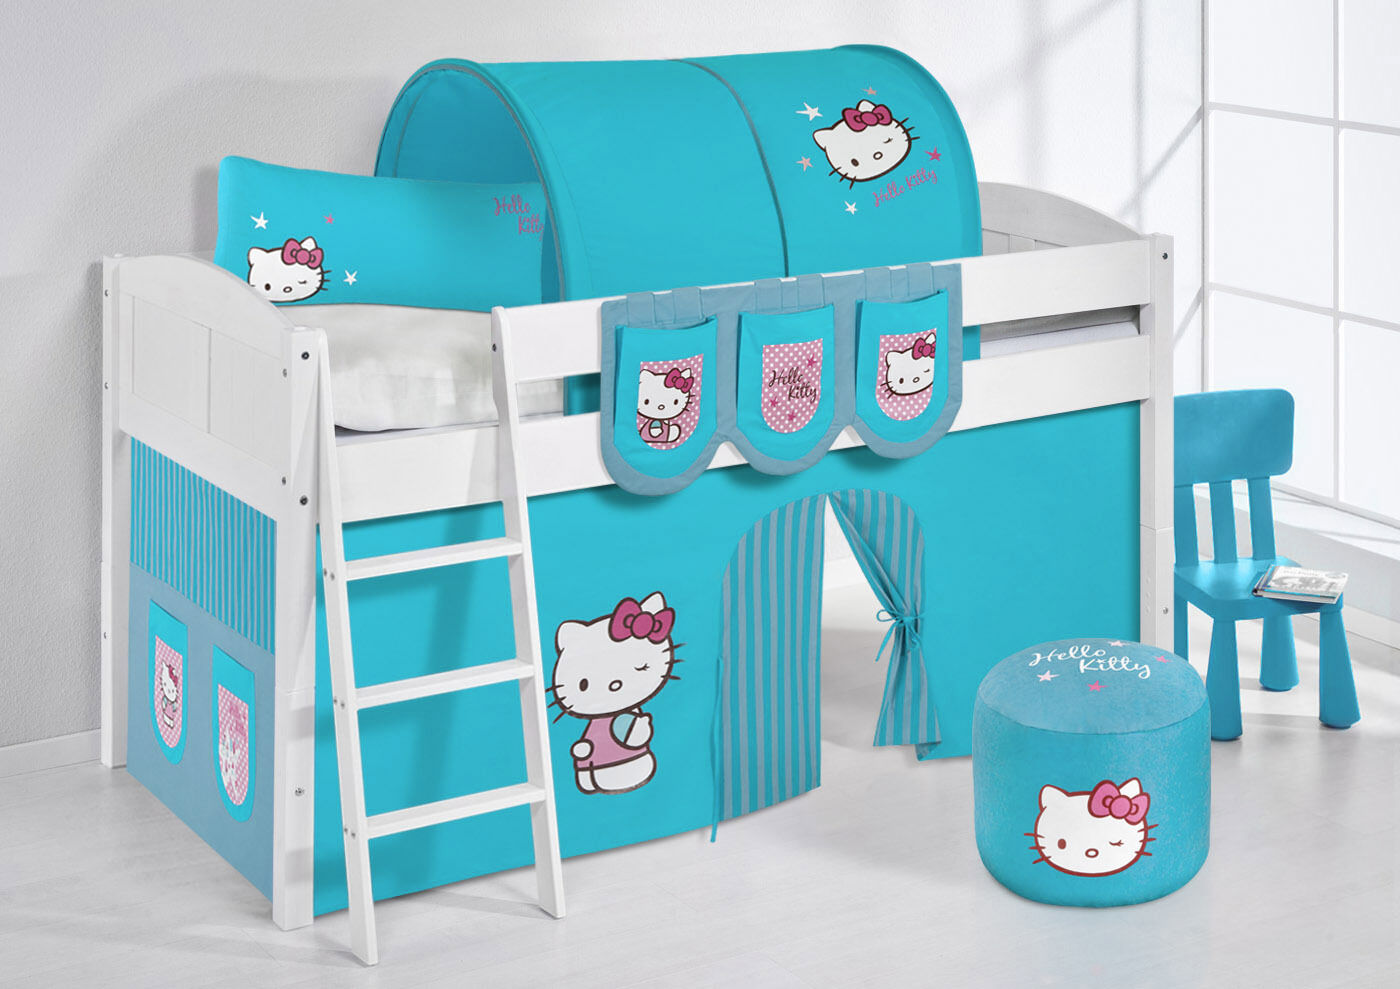 Spielbett surelevé lit enfant 4106 LILOKIDS HELLO KITTY turquoise